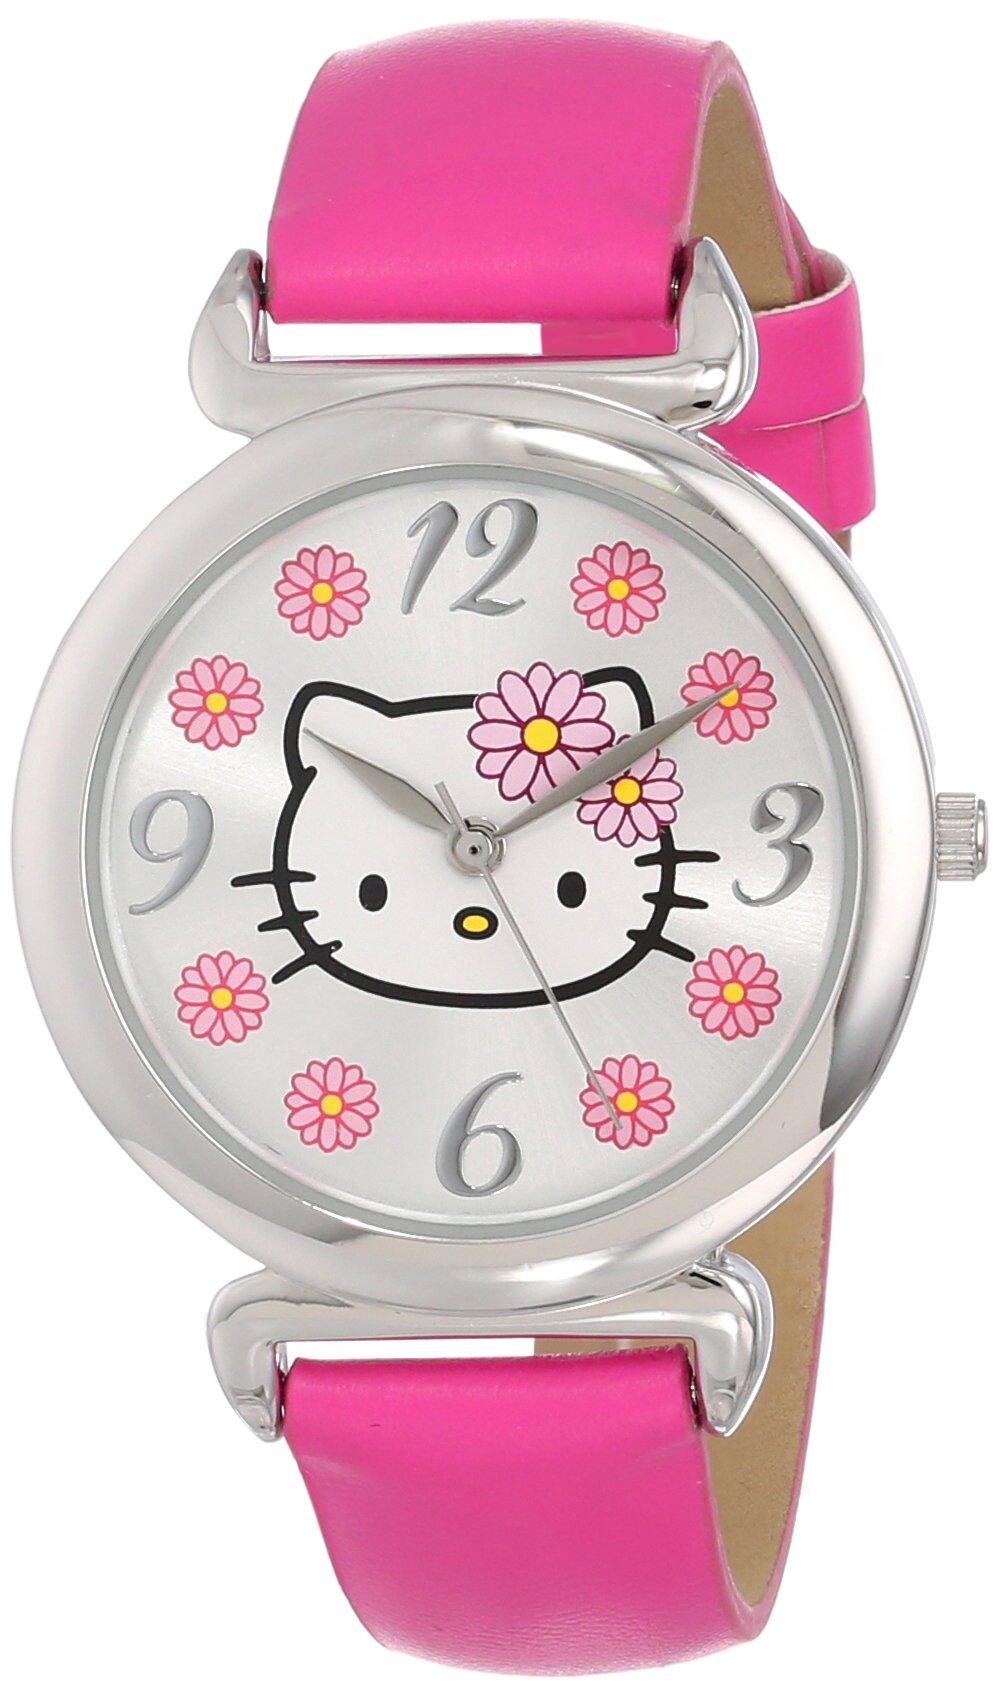 Sanrio Hello Kitty Women's HKAQ5371 Watch With Pink PU Band